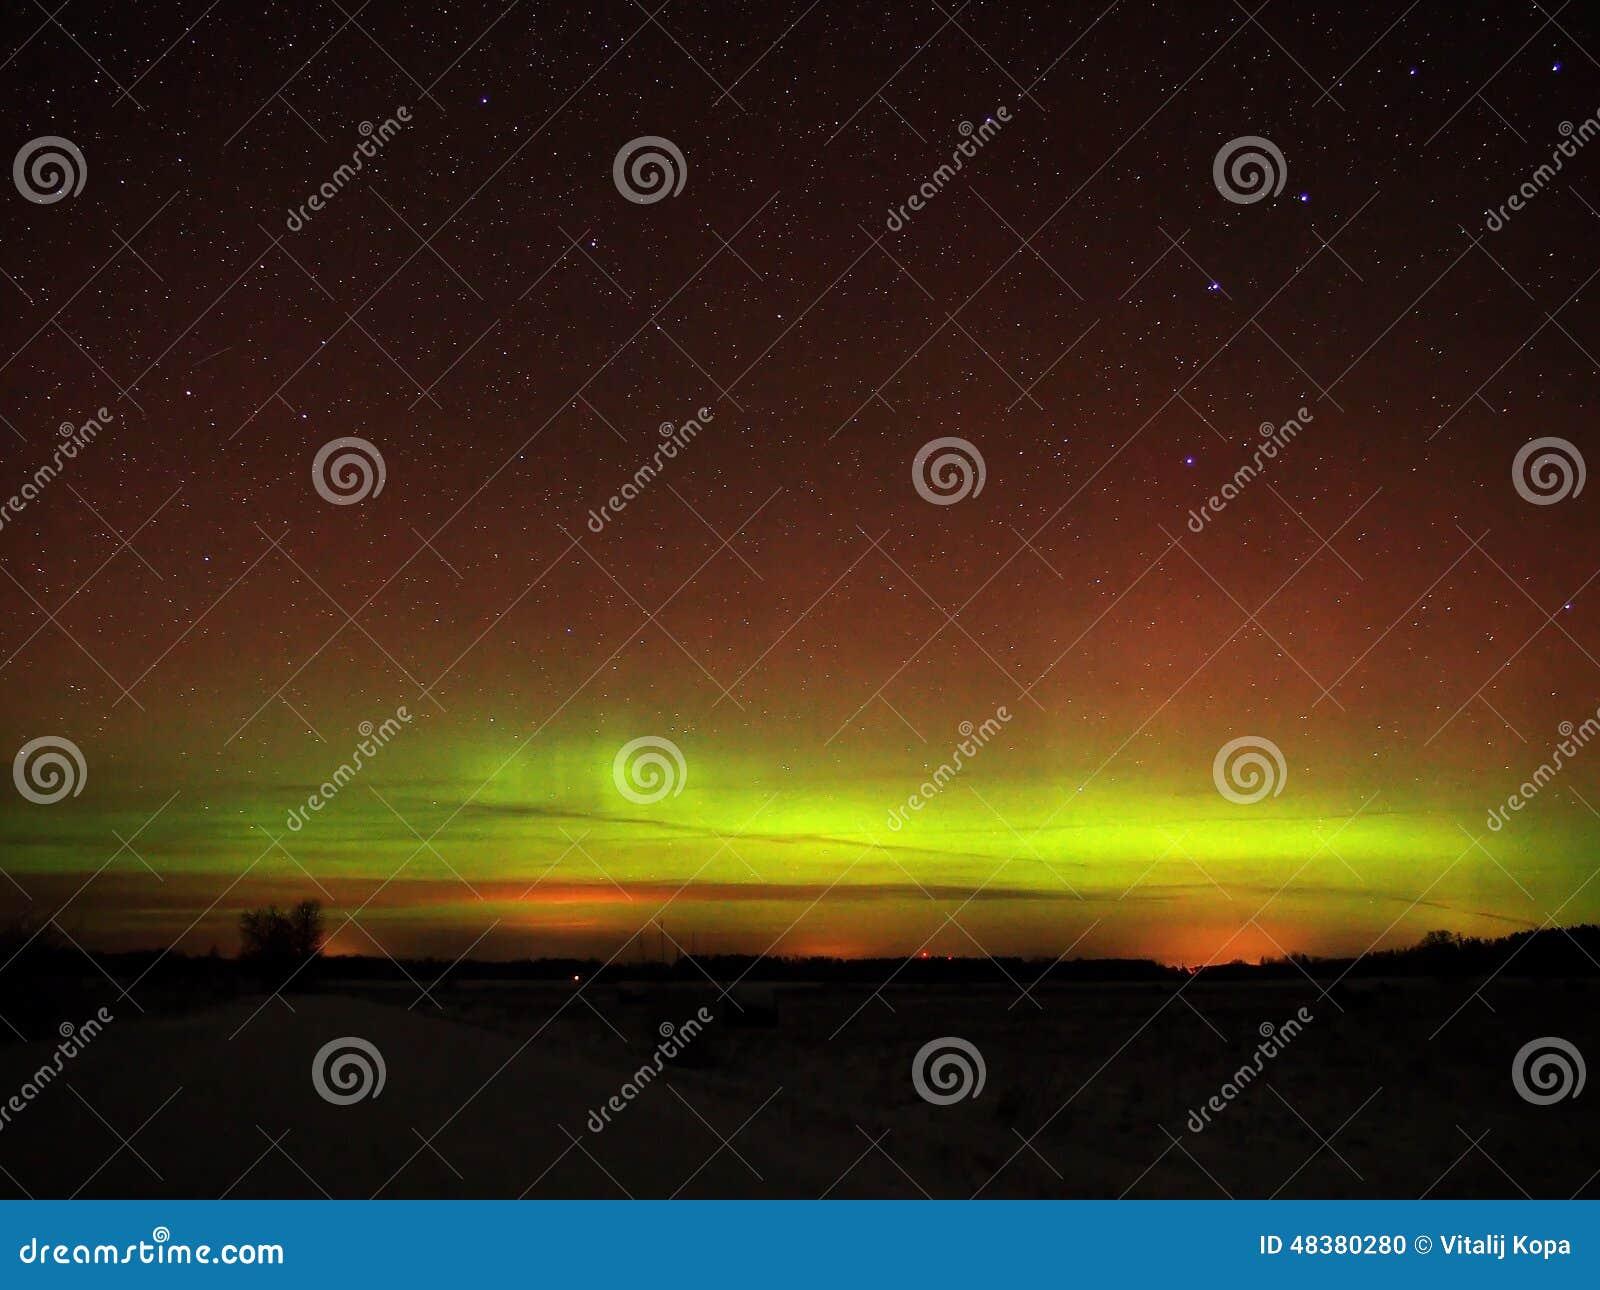 Aurora borealis polar lights and night sky stars over forest